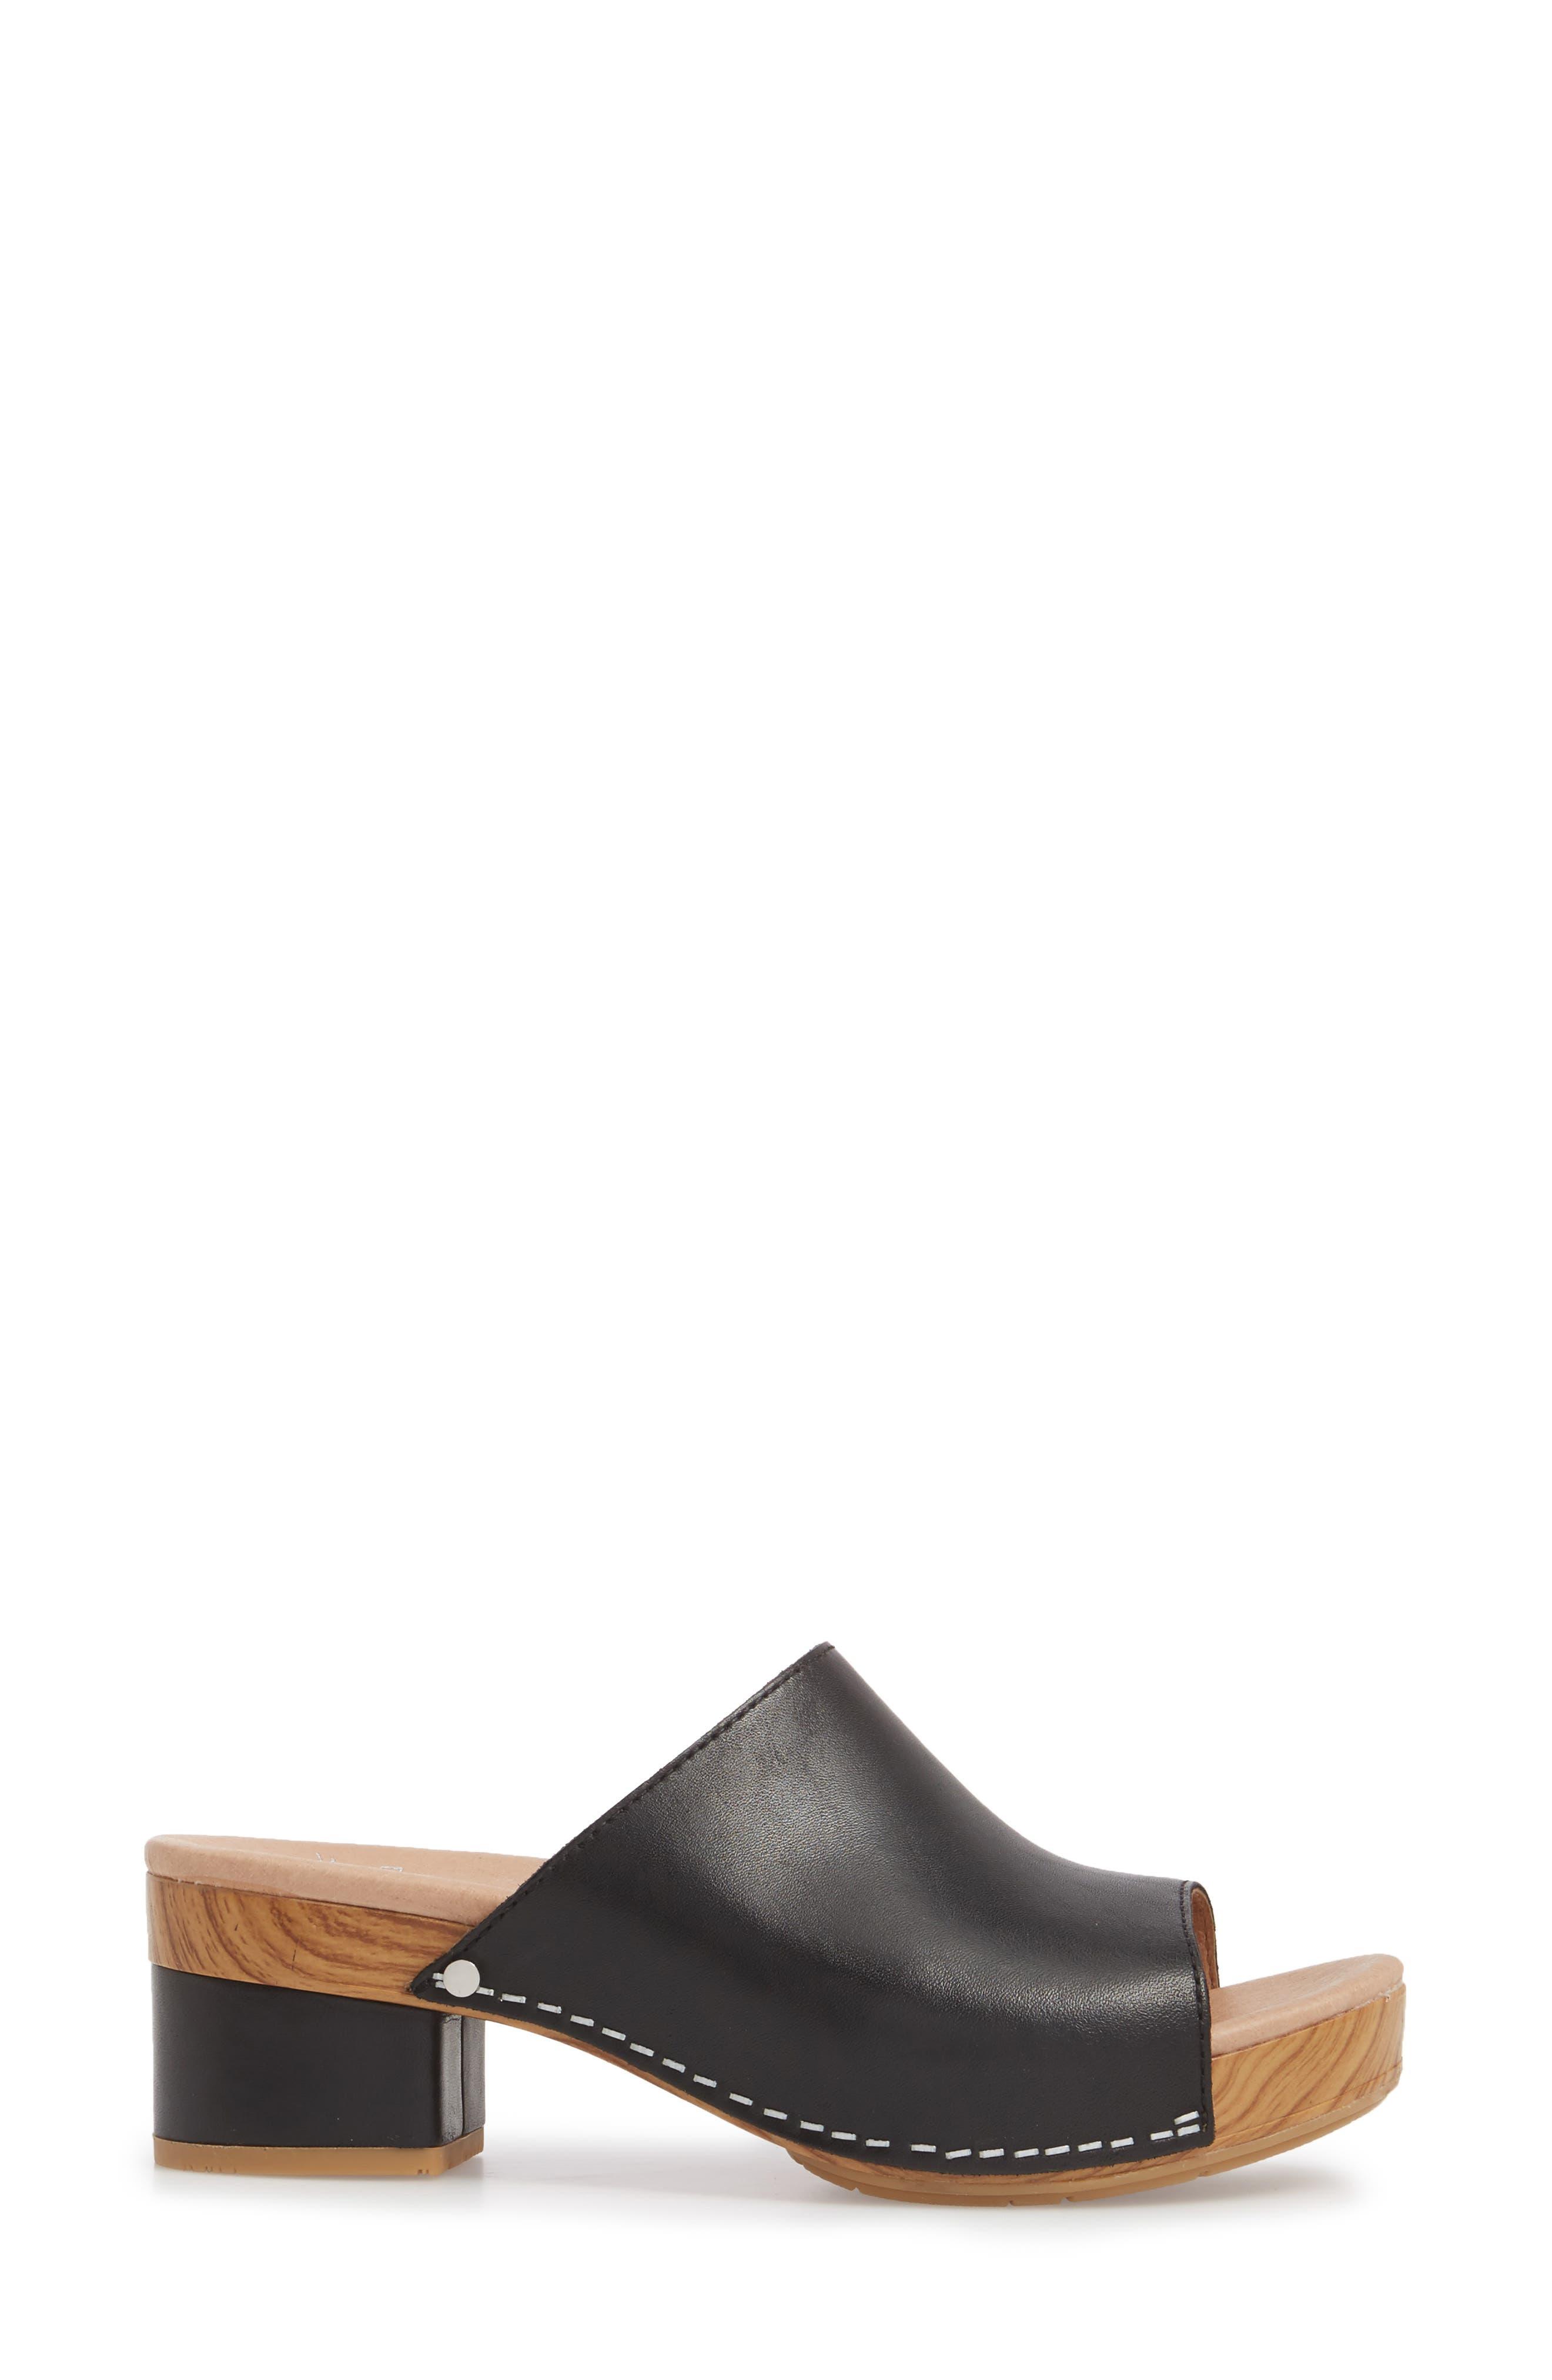 Maci Mule Sandal,                             Alternate thumbnail 3, color,                             BLACK LEATHER